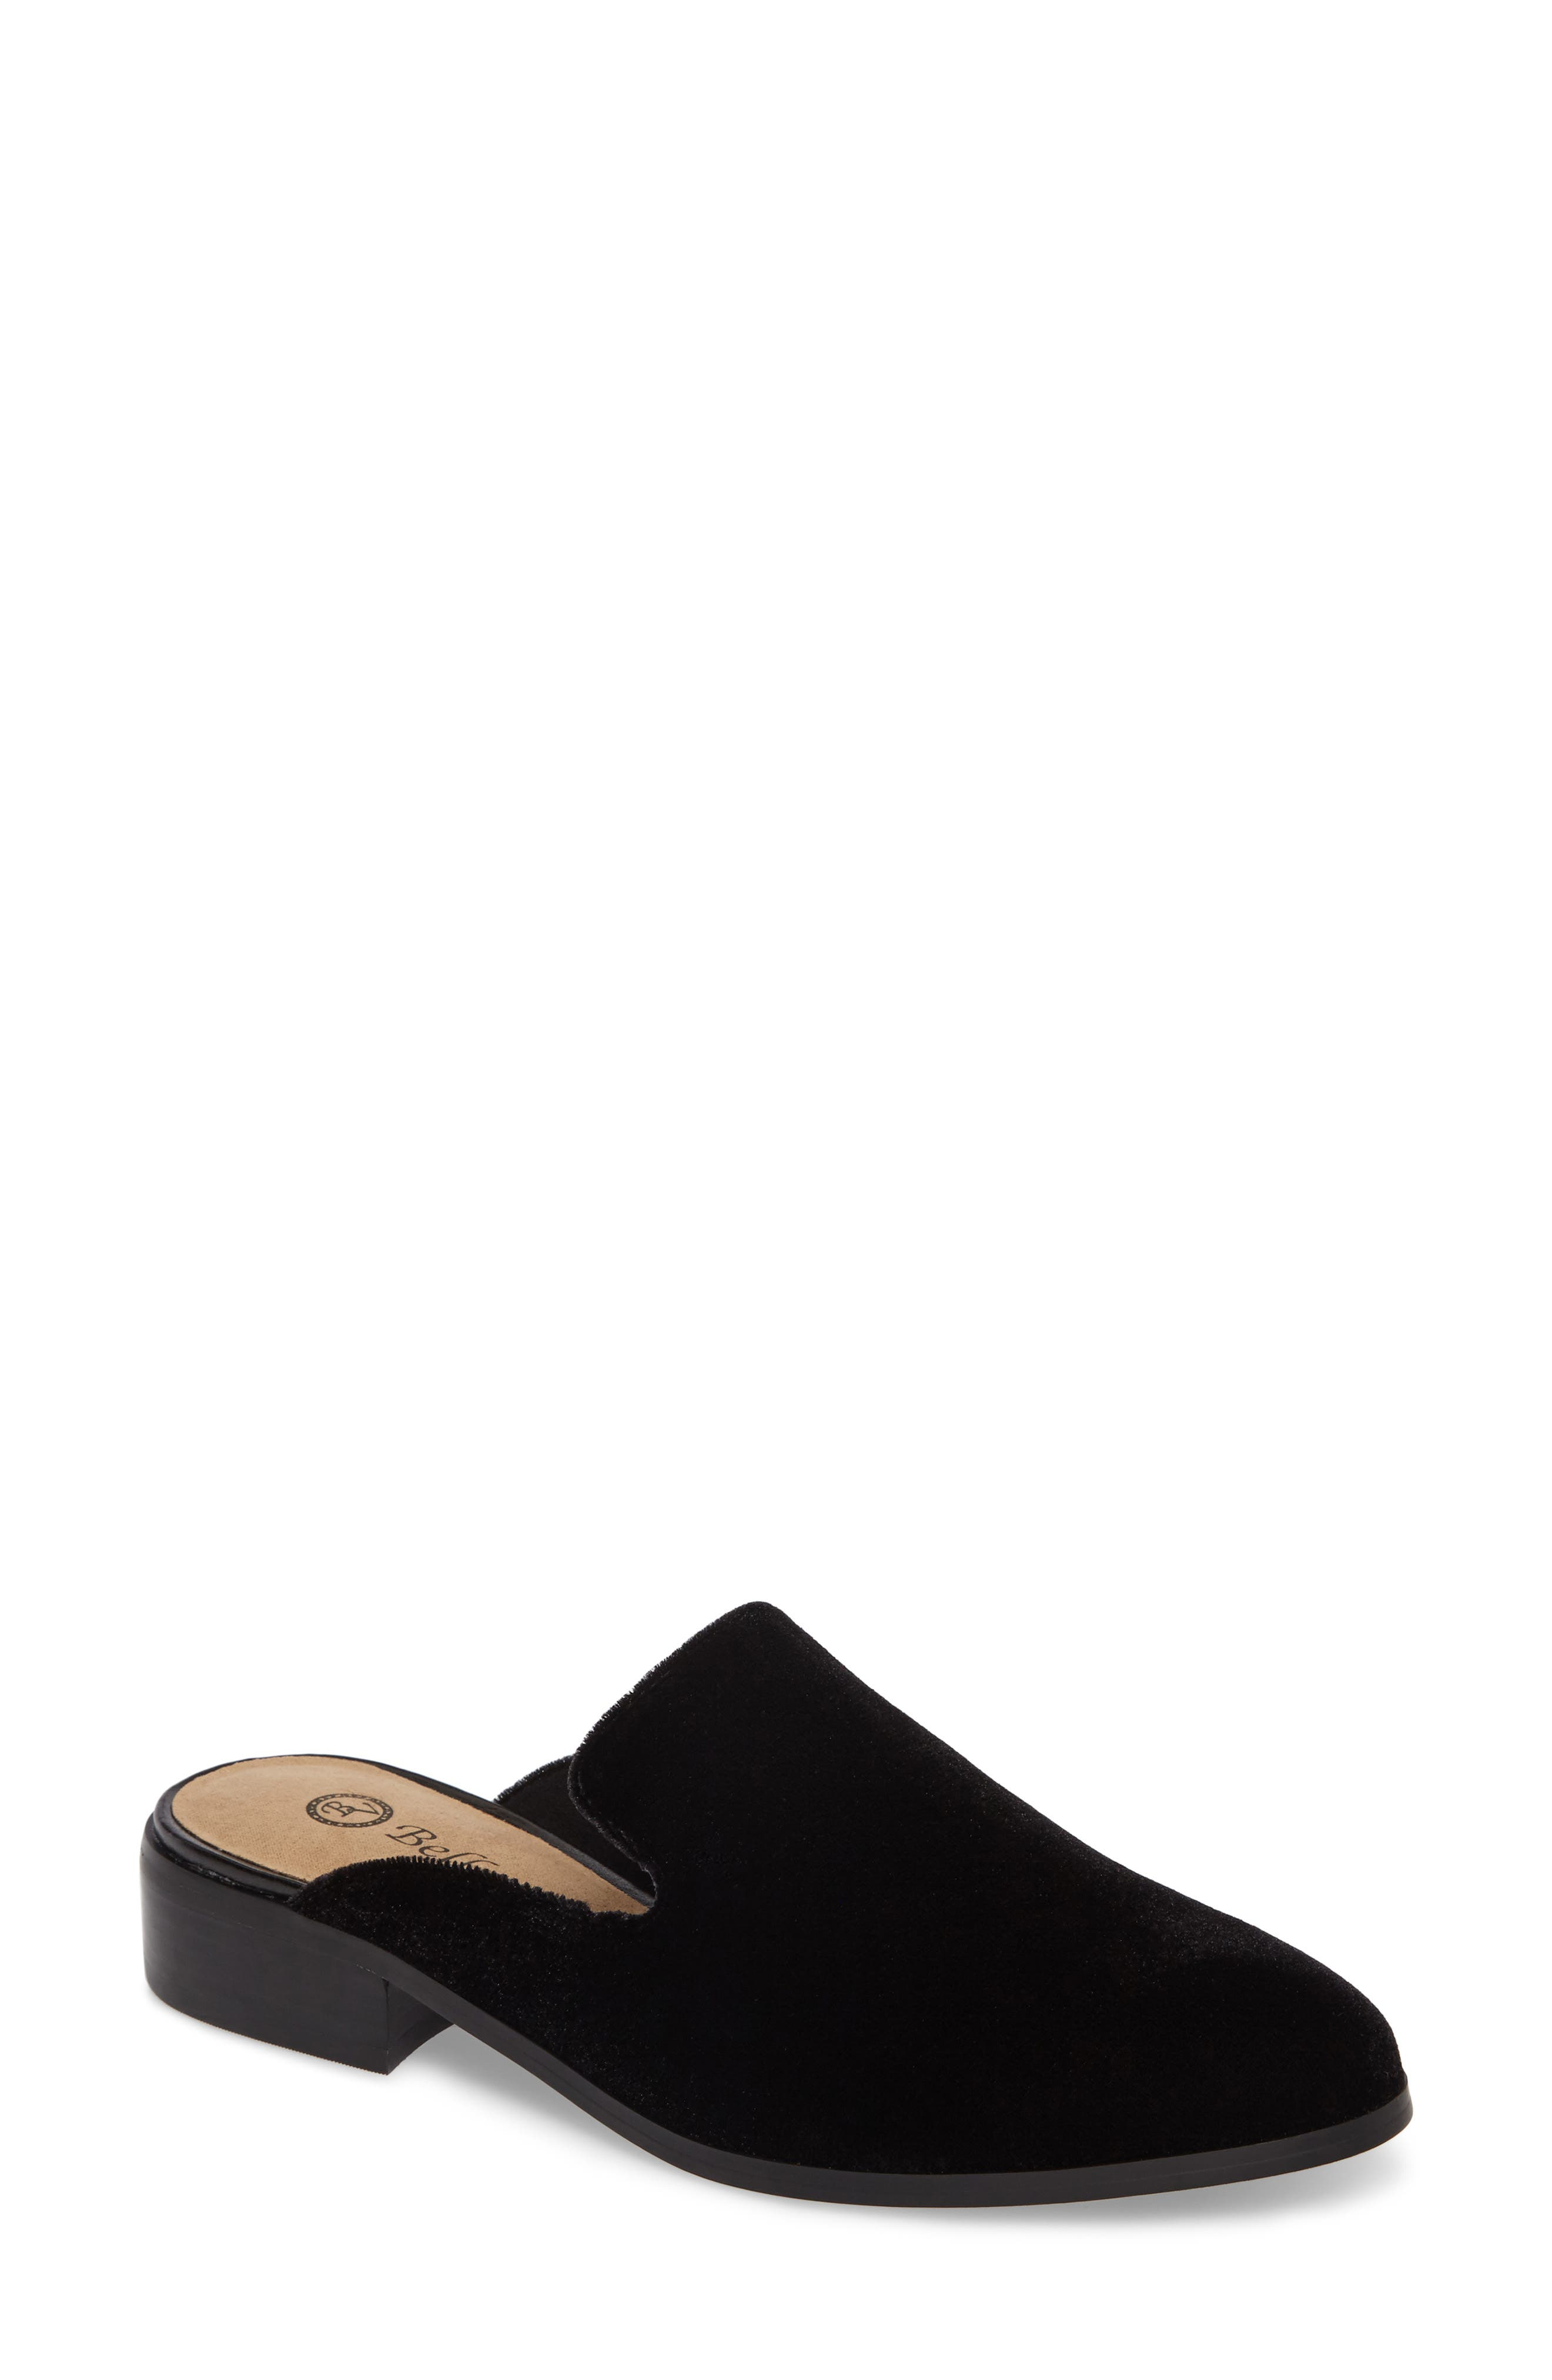 Briar II Loafer Mule,                         Main,                         color, Black Fabric